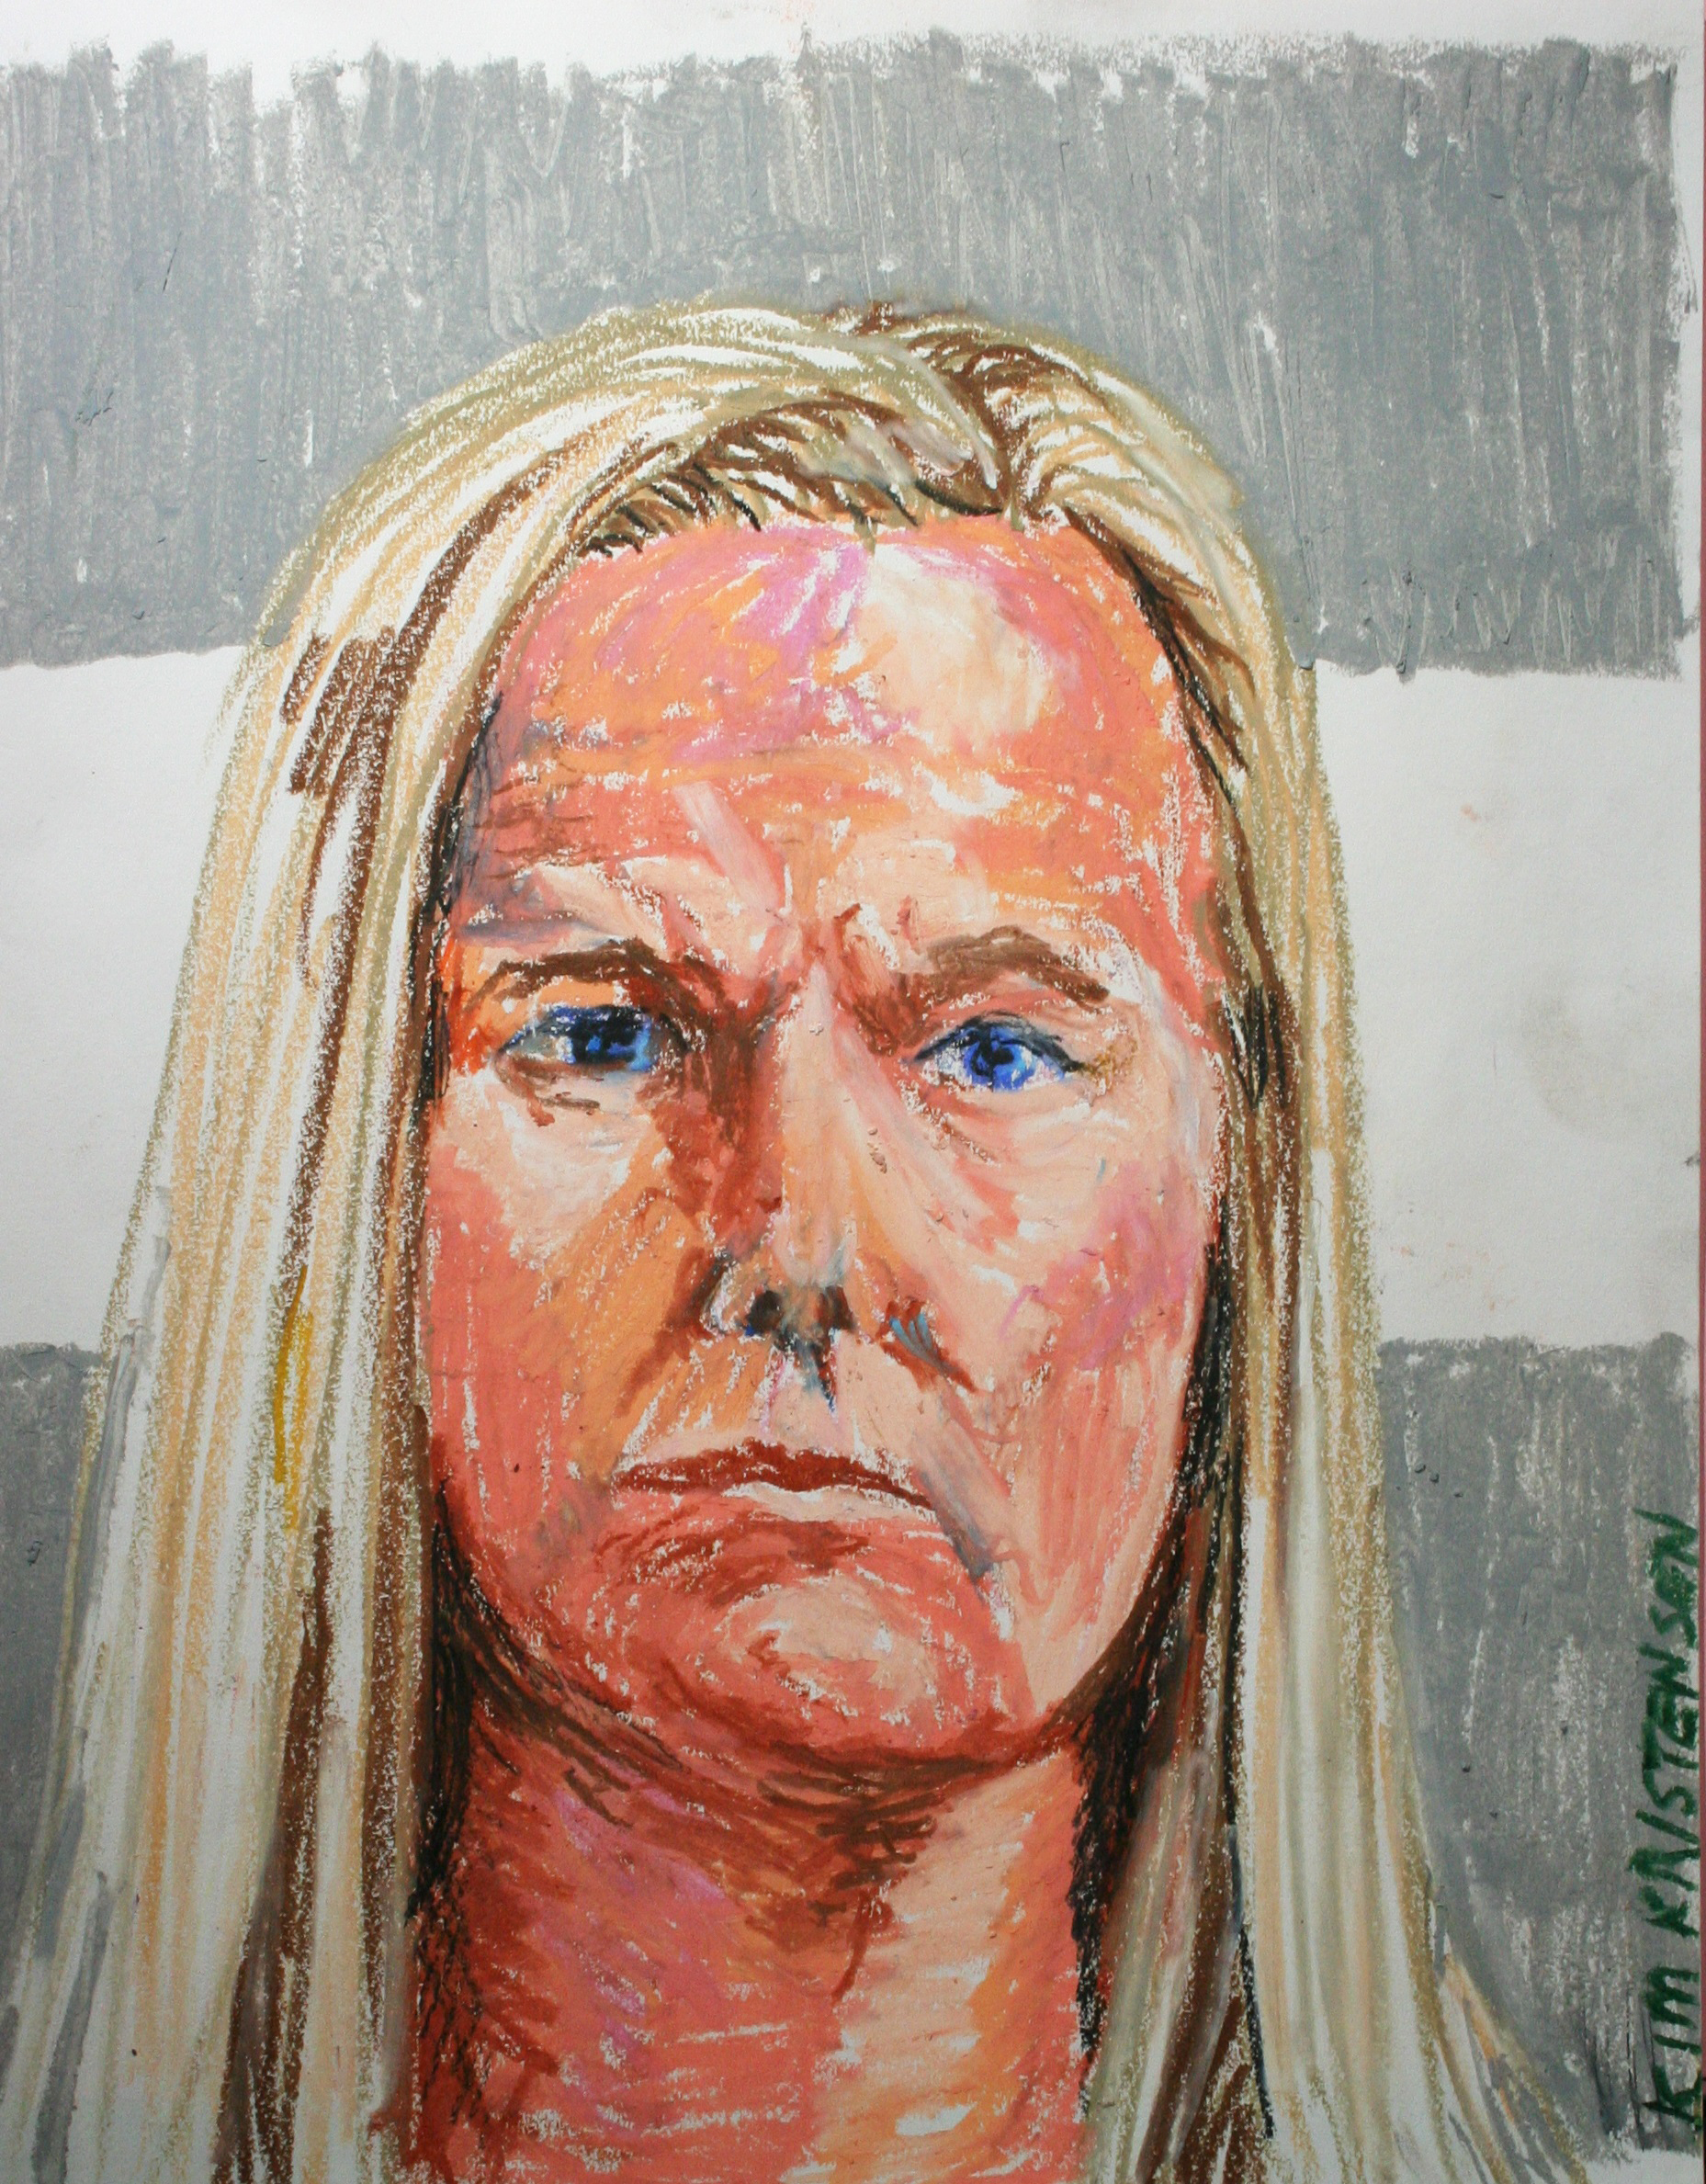 Kim Kristensen did this 2-hour pastel drawing.